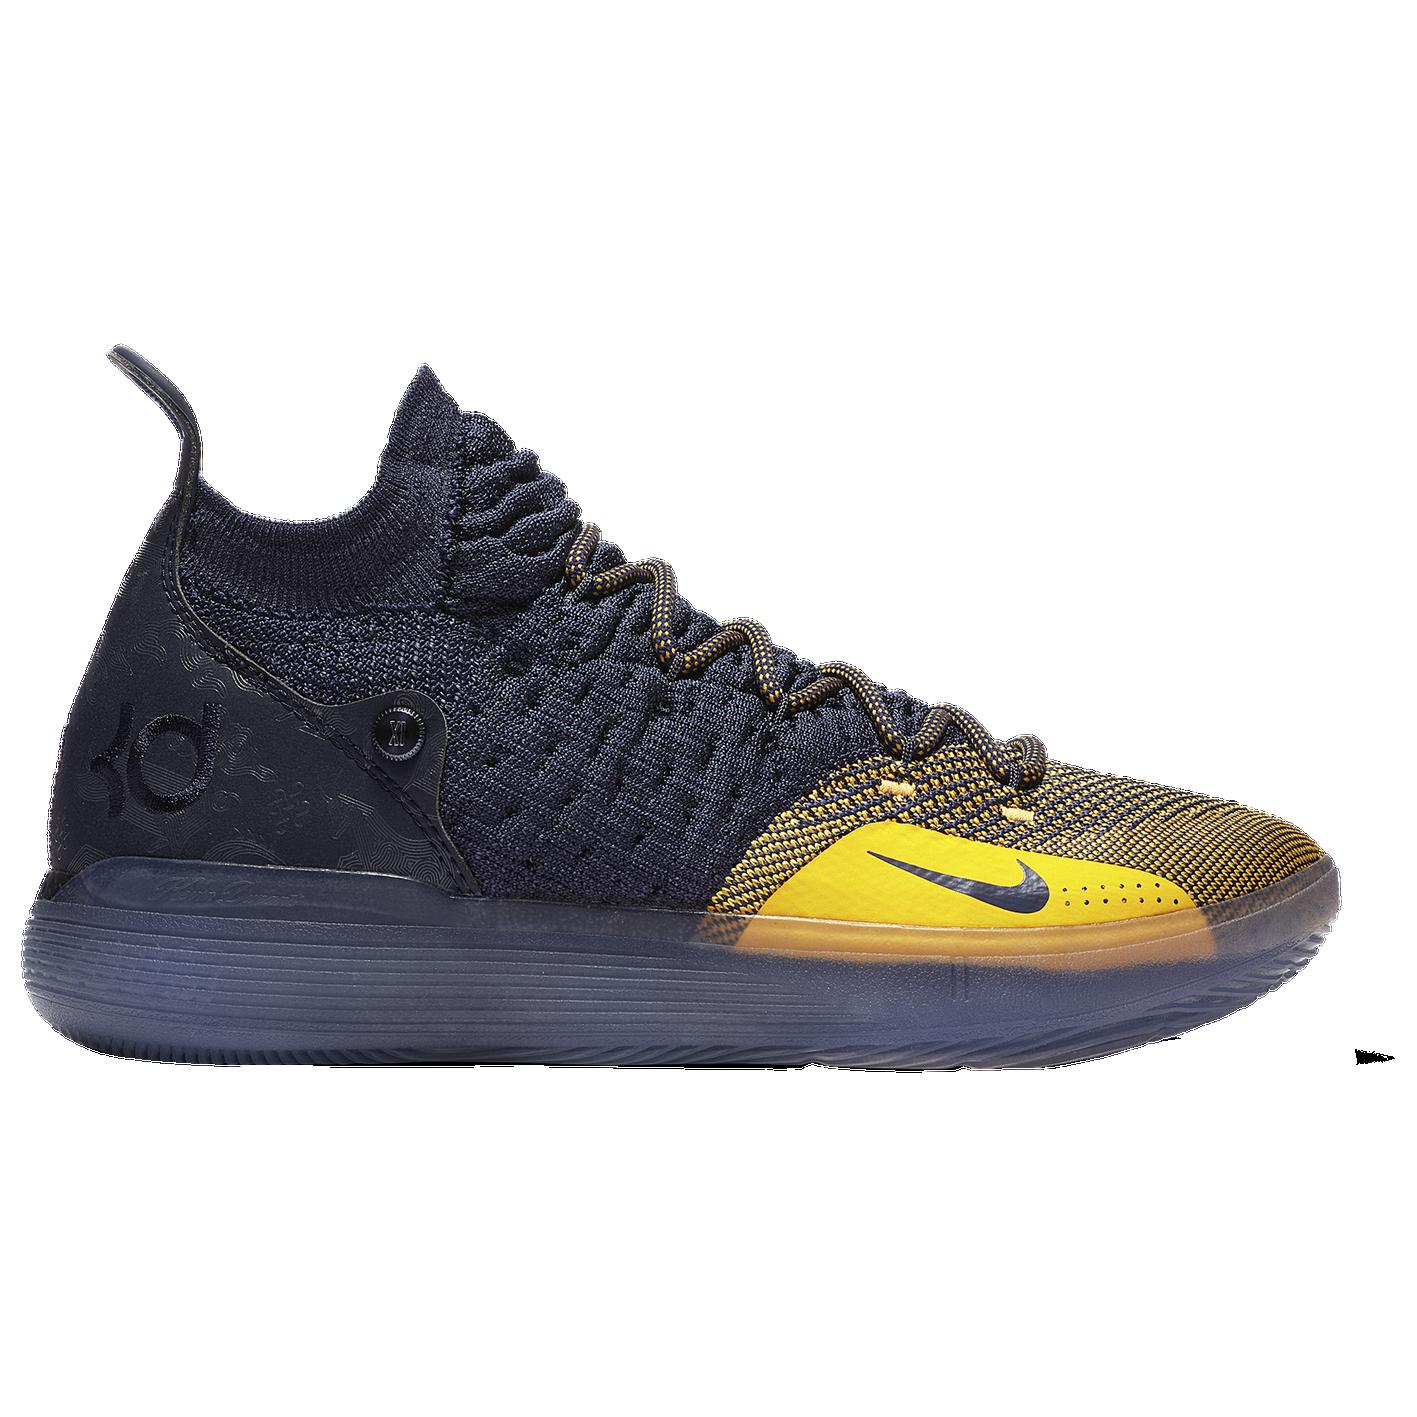 944b83f7e2c2 Nike KD 11 - Men s - Basketball - Shoes - Durant